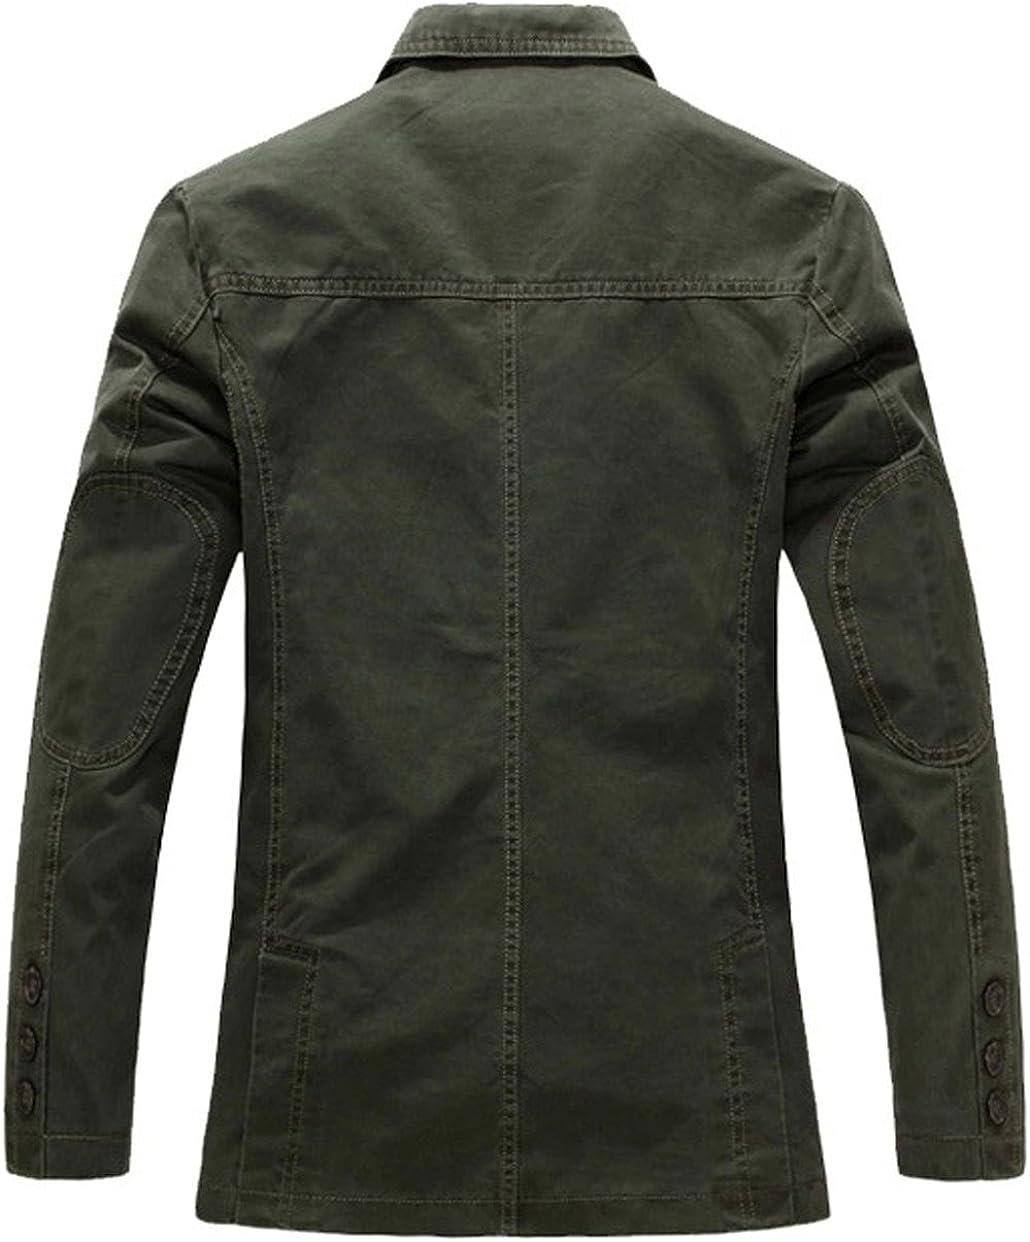 LEOCLOTHO Mens Casual Blazer Slim Fit Classic Military Suit Jacket Multi-Pocket Light Coat